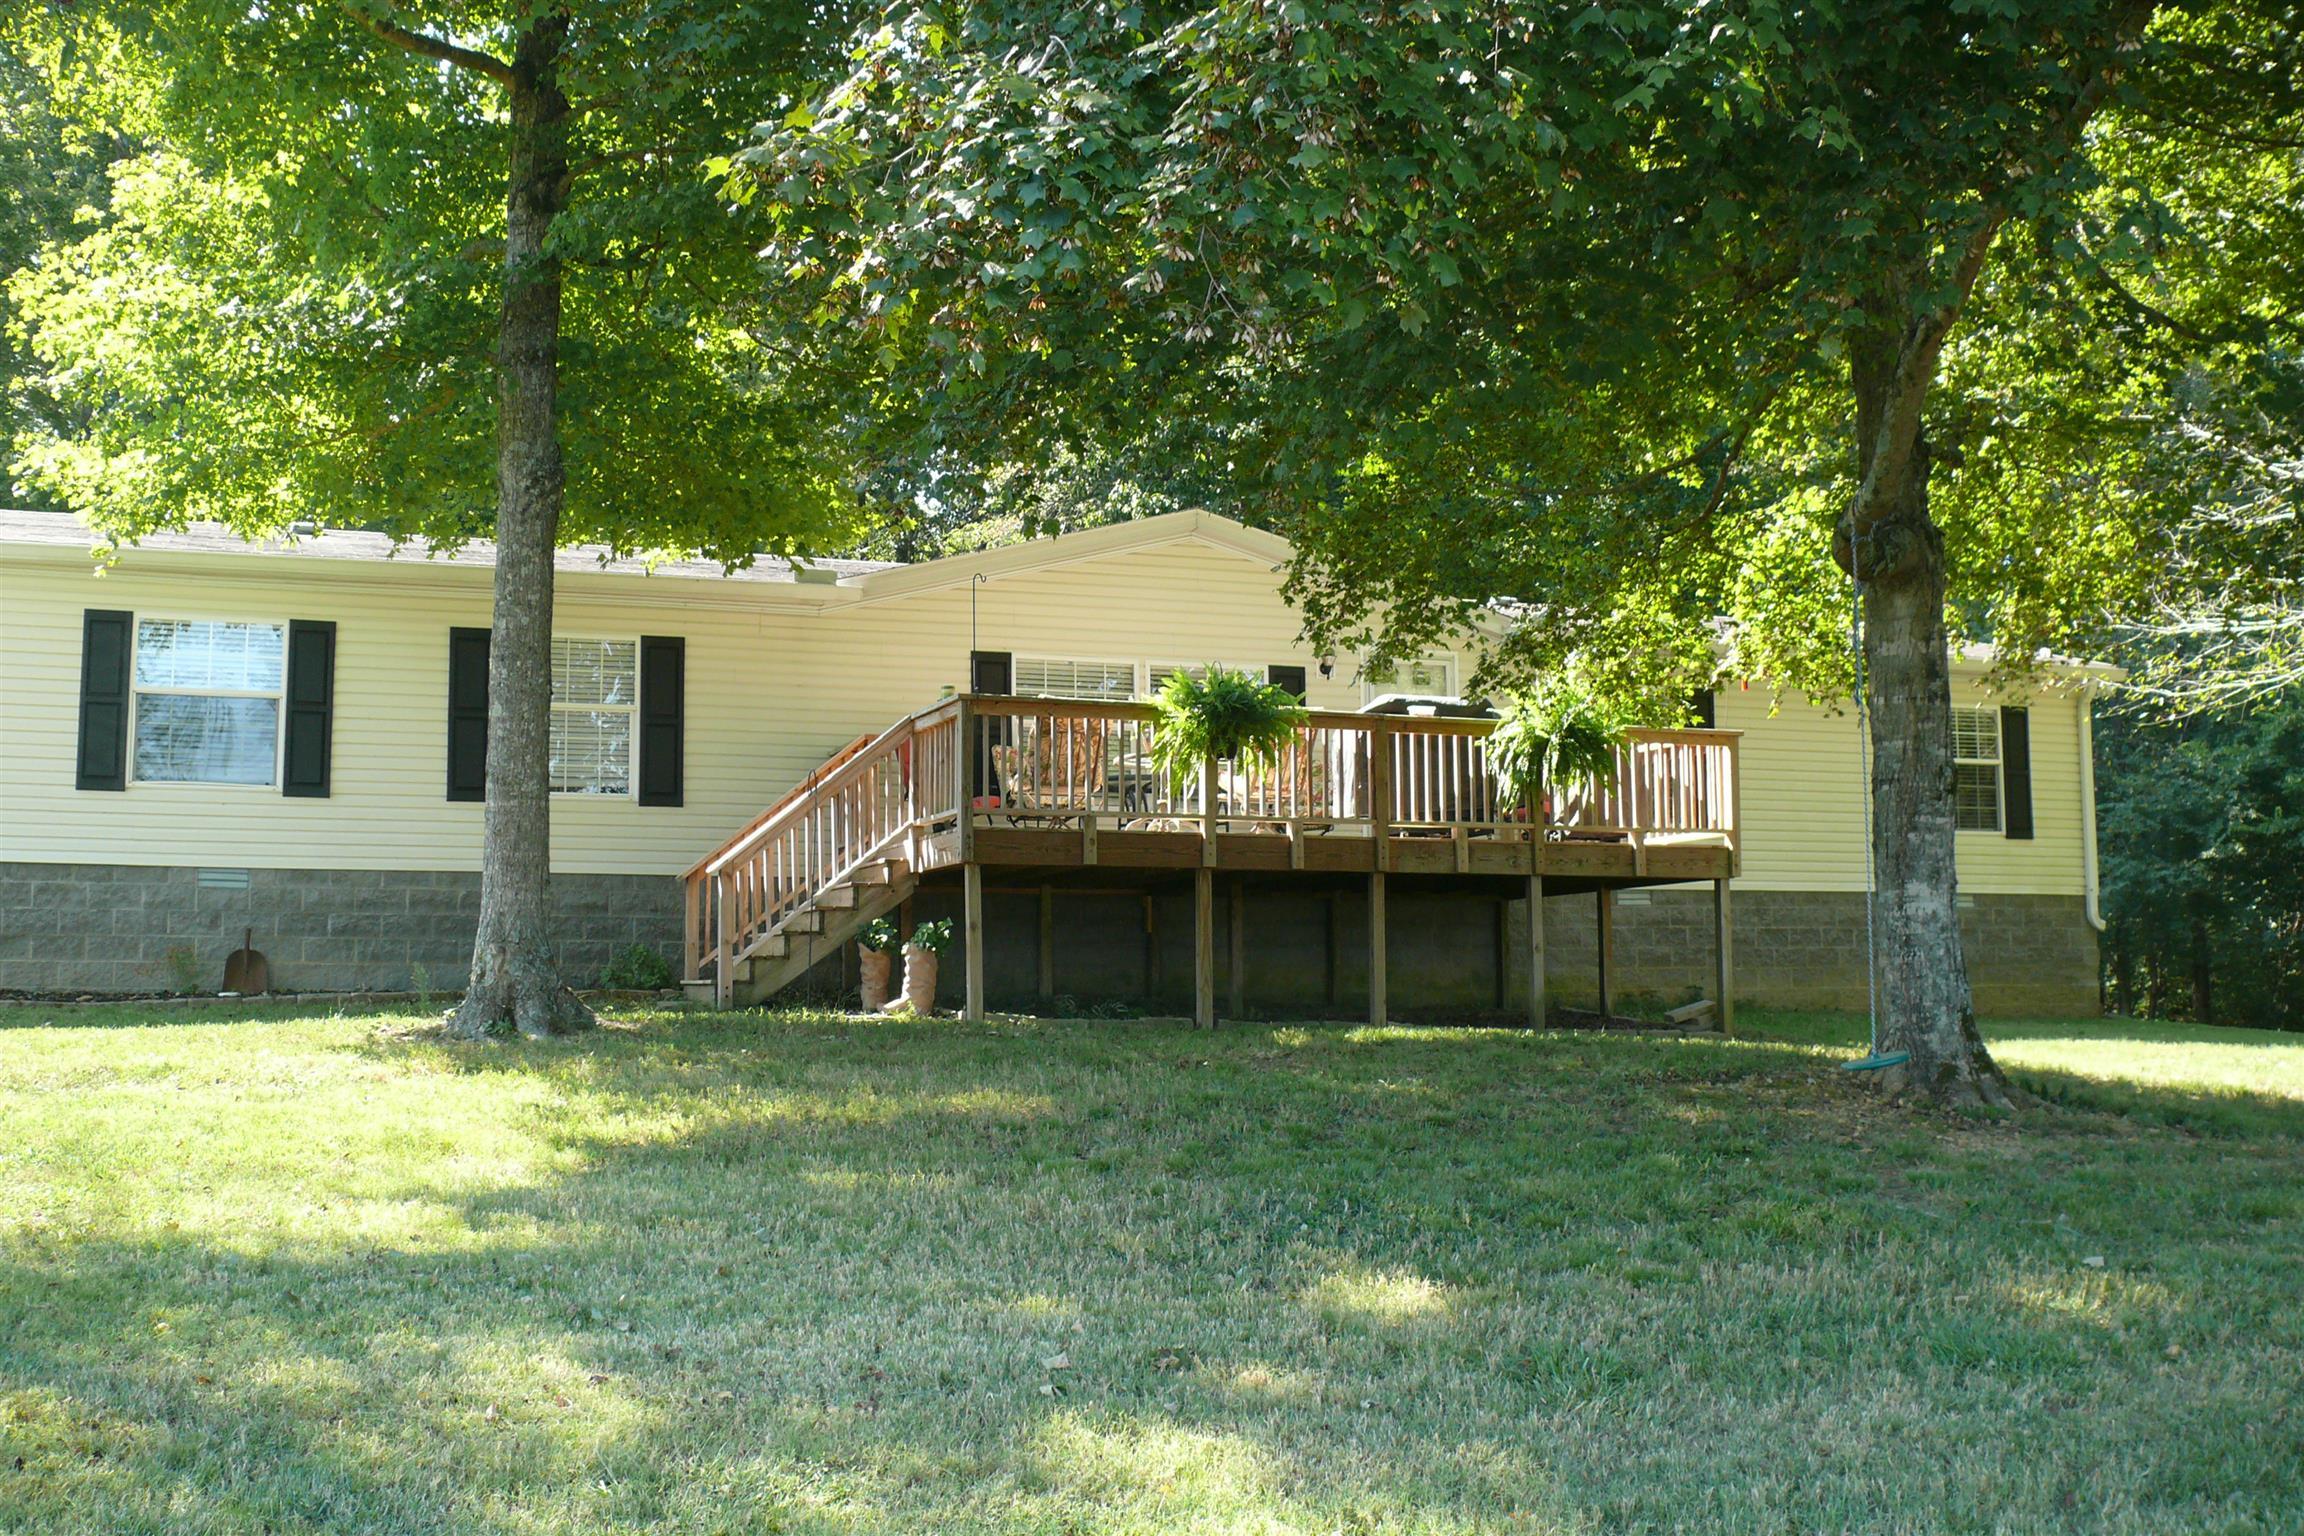 400 Jesse Work Rd, Dickson, TN 37055 - Dickson, TN real estate listing